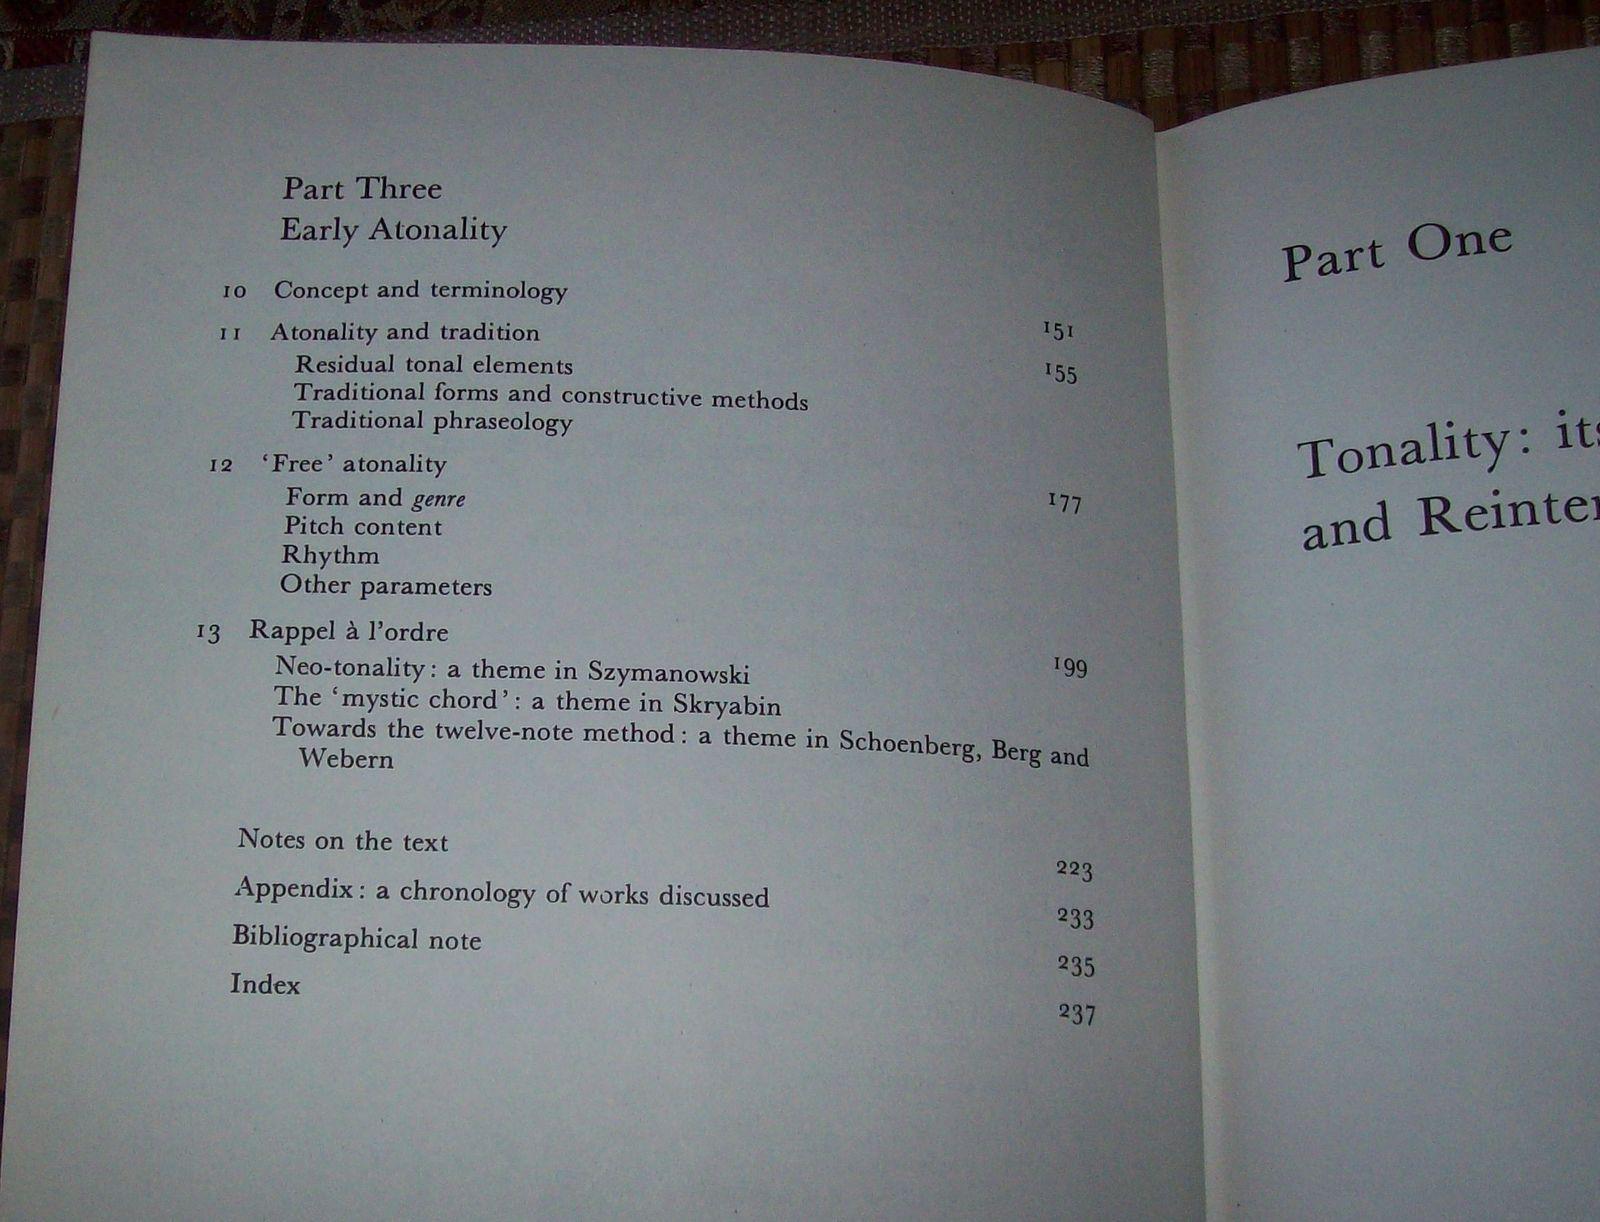 Music in Transition 1900-1920 by Jim Samson 1977 HBDJ